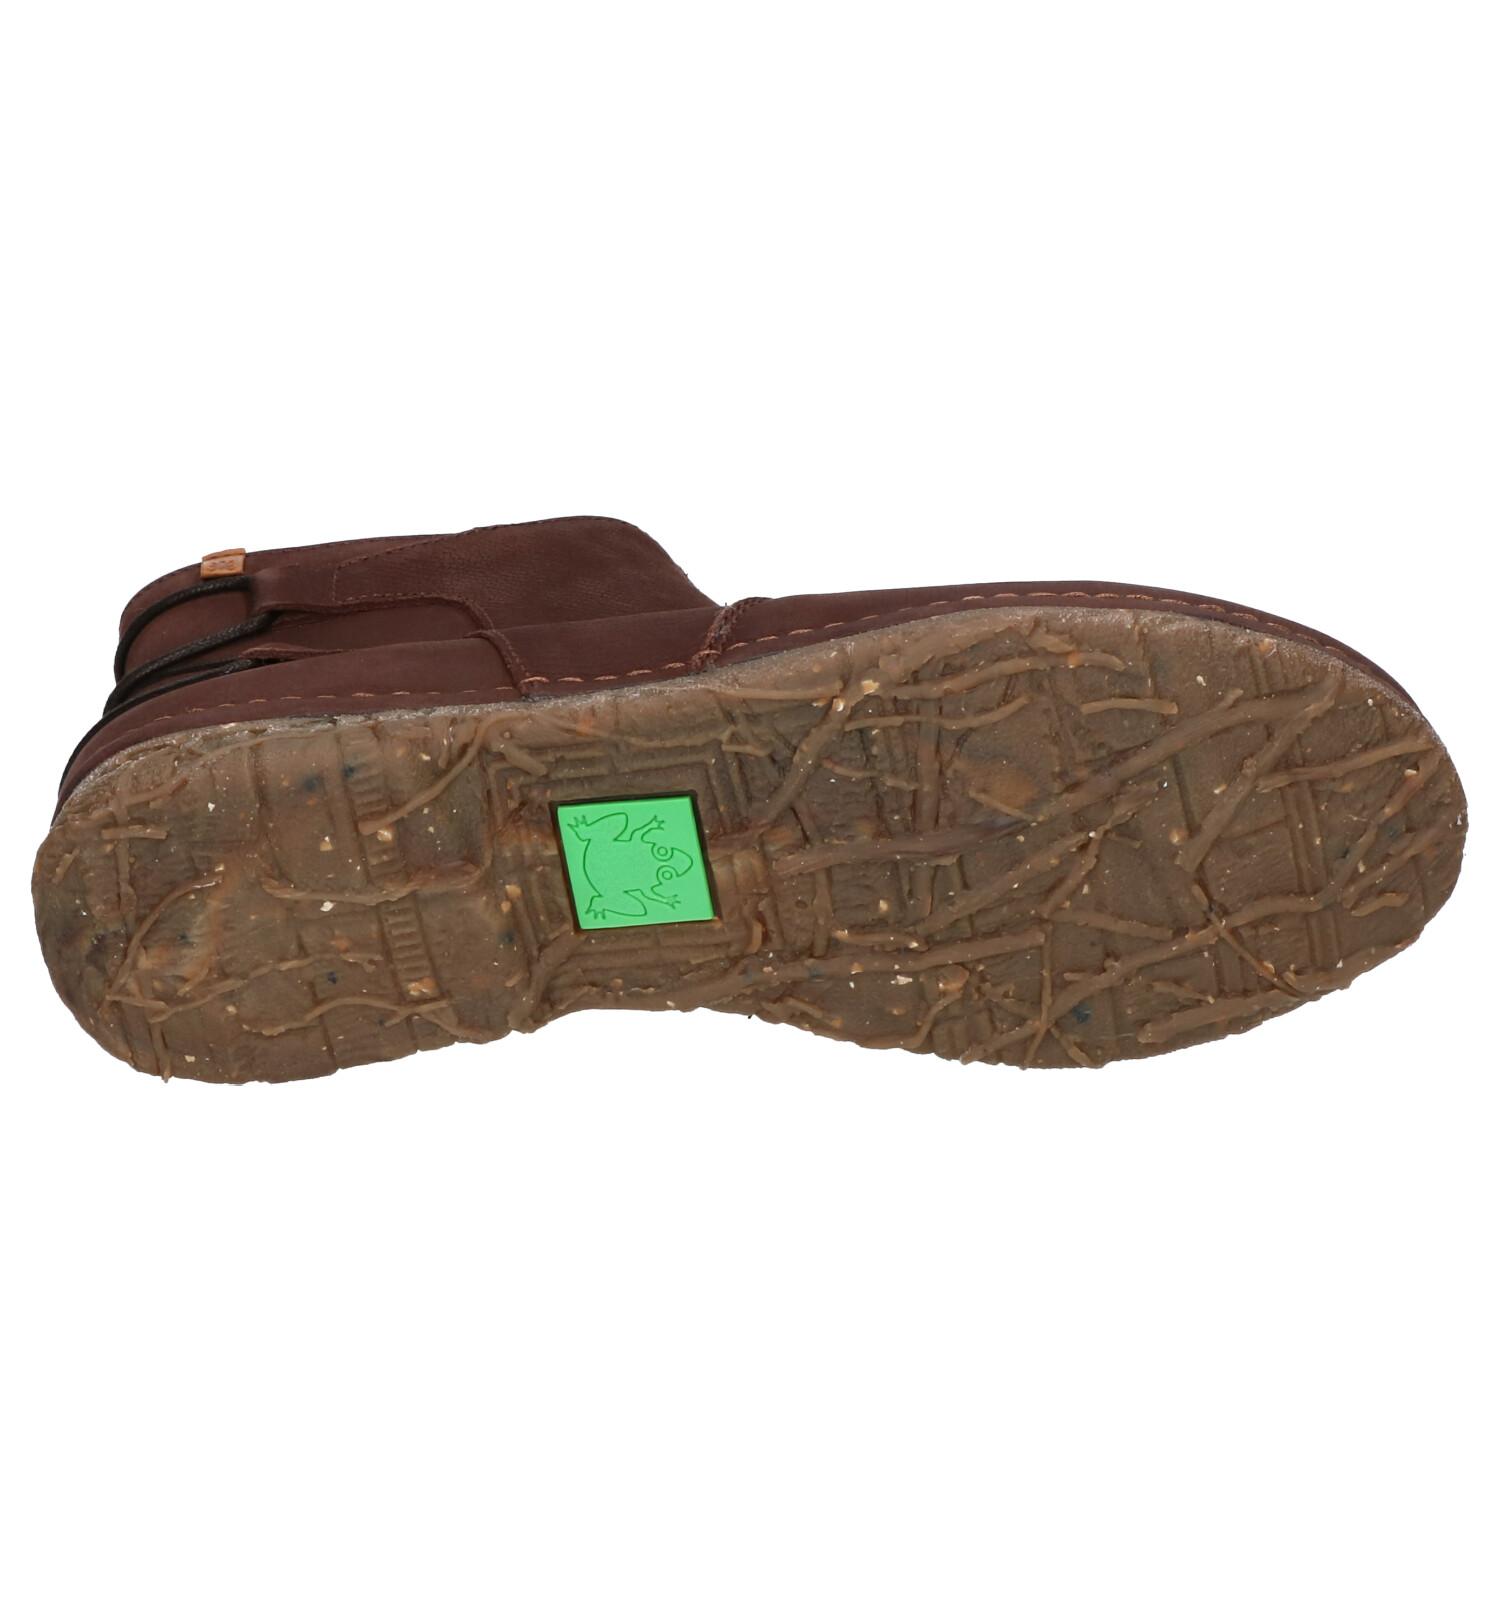 Bruine Naturalista Boots El Angkor eE2IYbDHW9